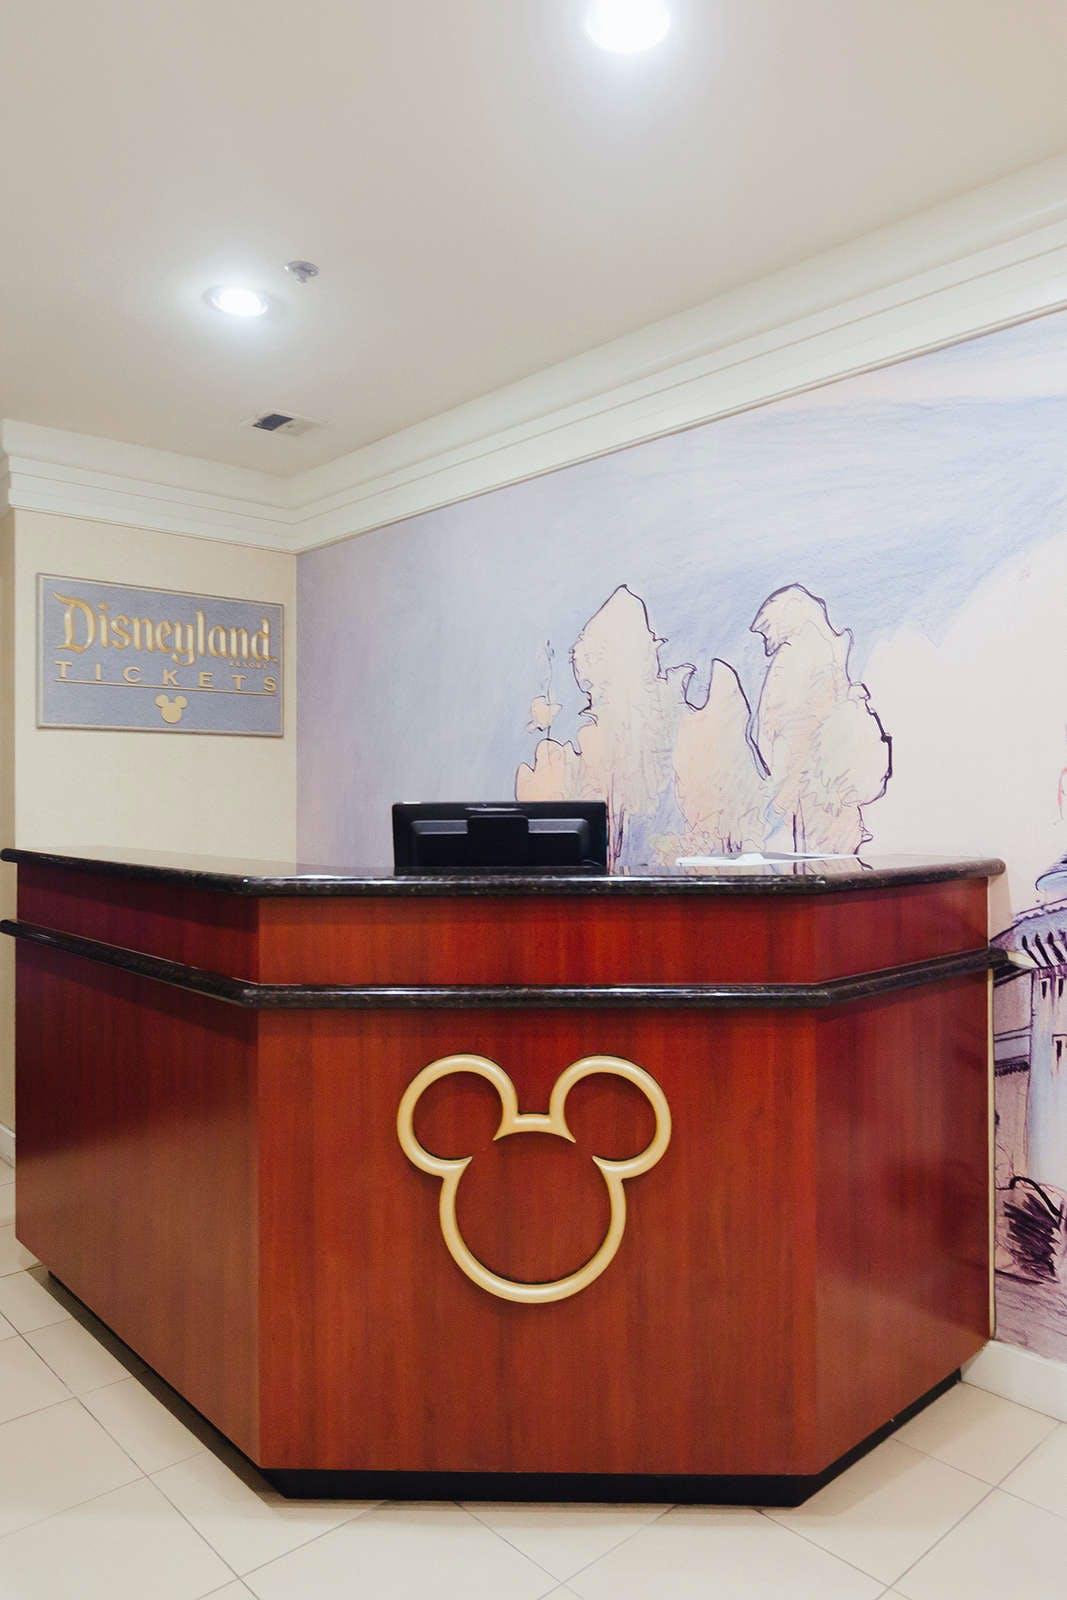 Clementine Hotel & Suites